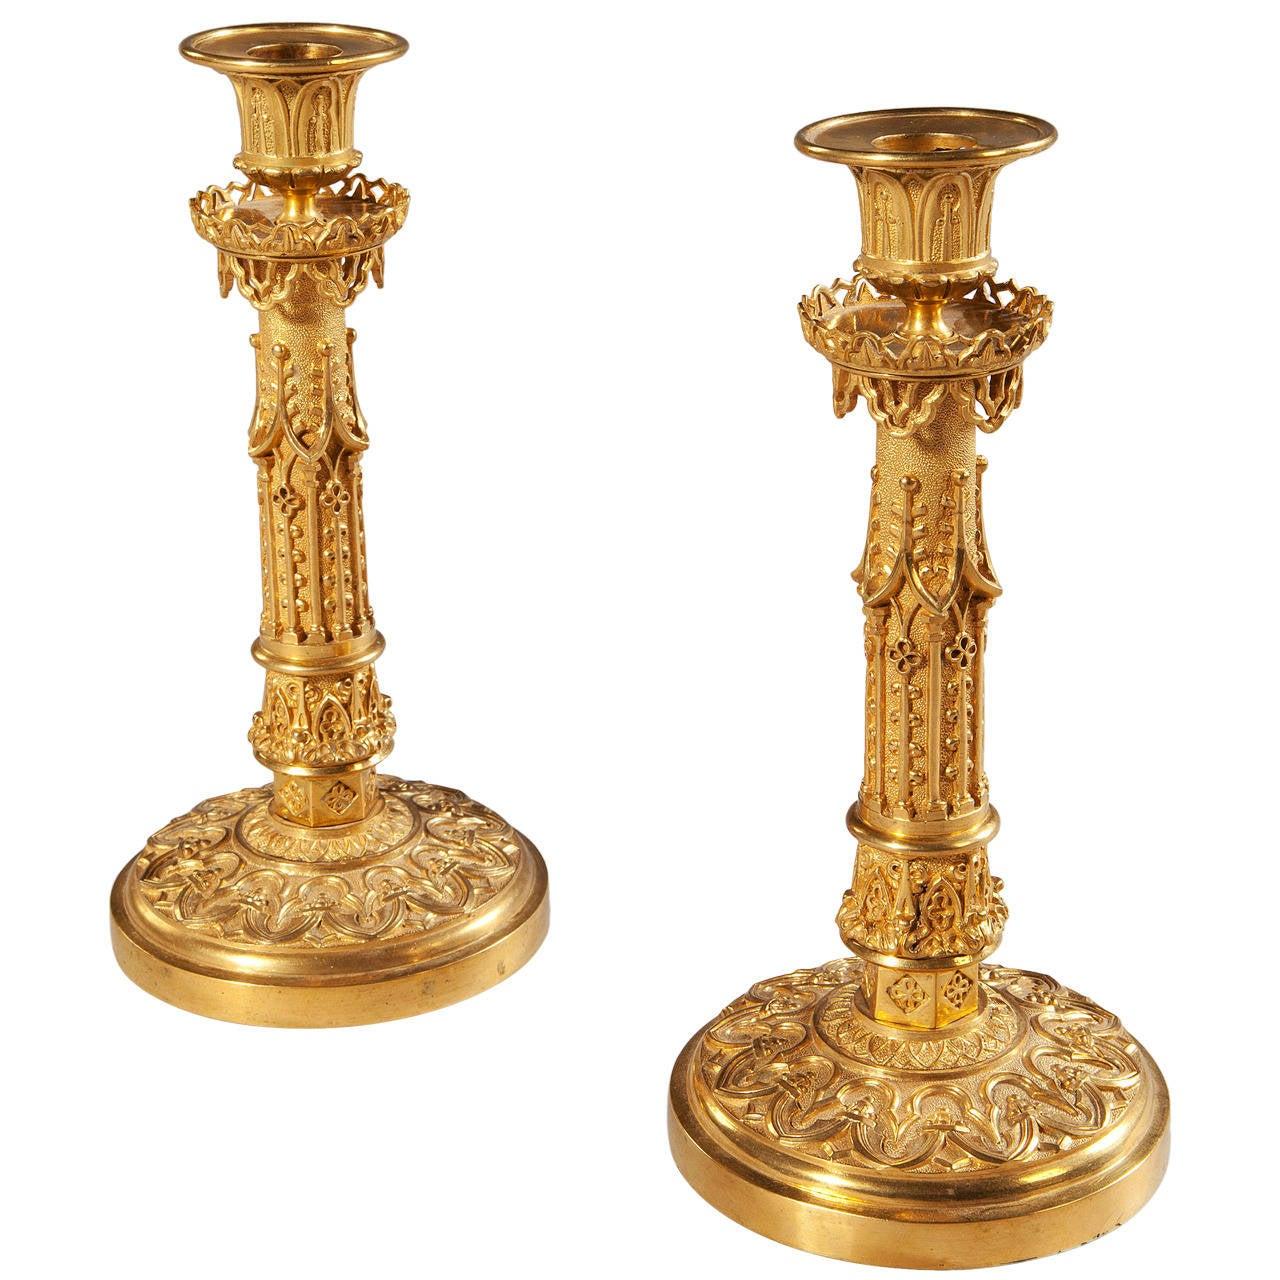 Pair of Charles X gilt-bronze candlesticks, 1825